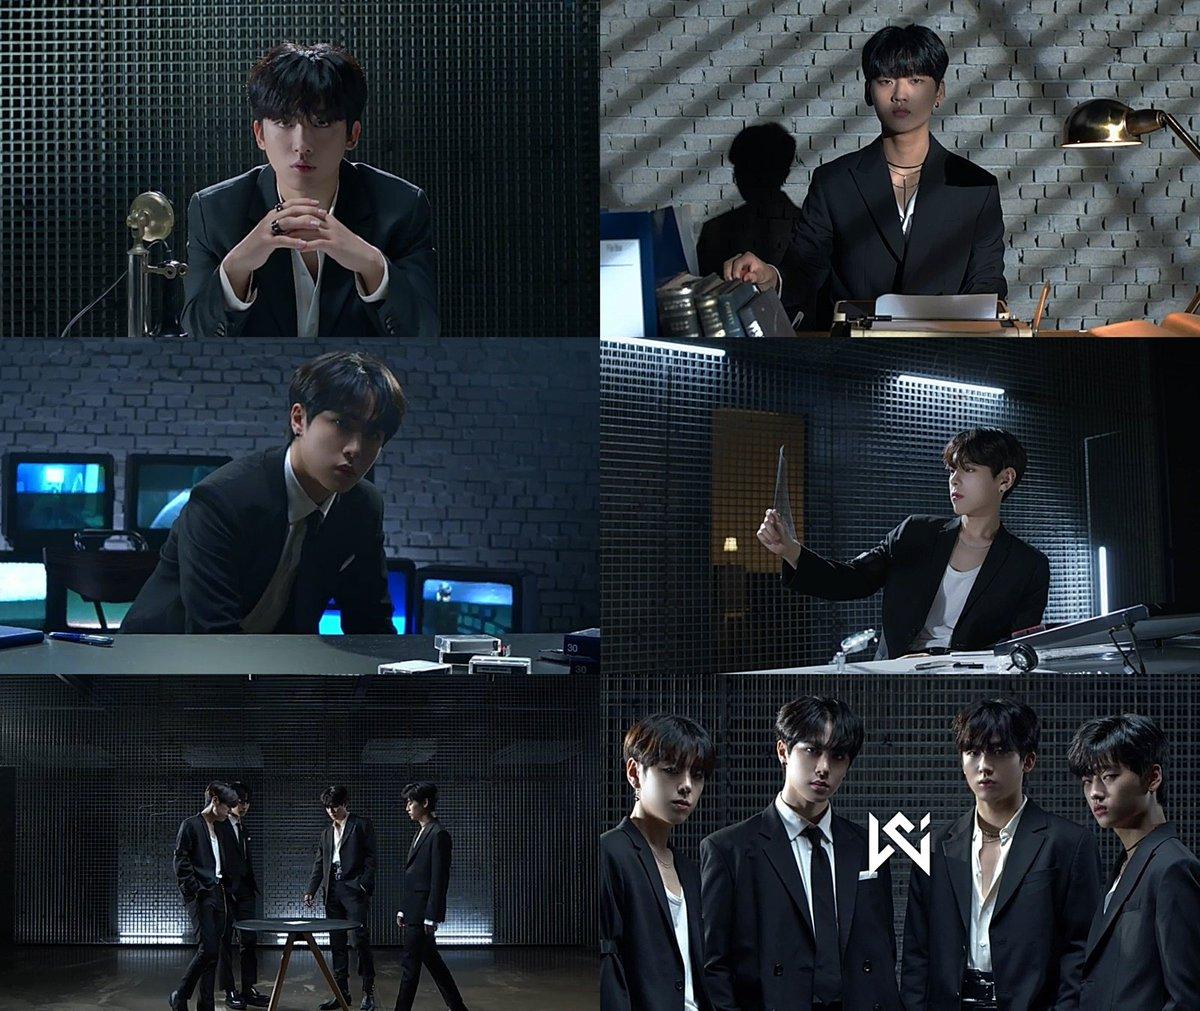 OUI BOYS (Kim Yo Han, Kim Dong Han, Kang Suk Hwa, and Jang Dae Hyun) announces their official group name 👉 WEi Source: n.news.naver.com/entertain/arti…